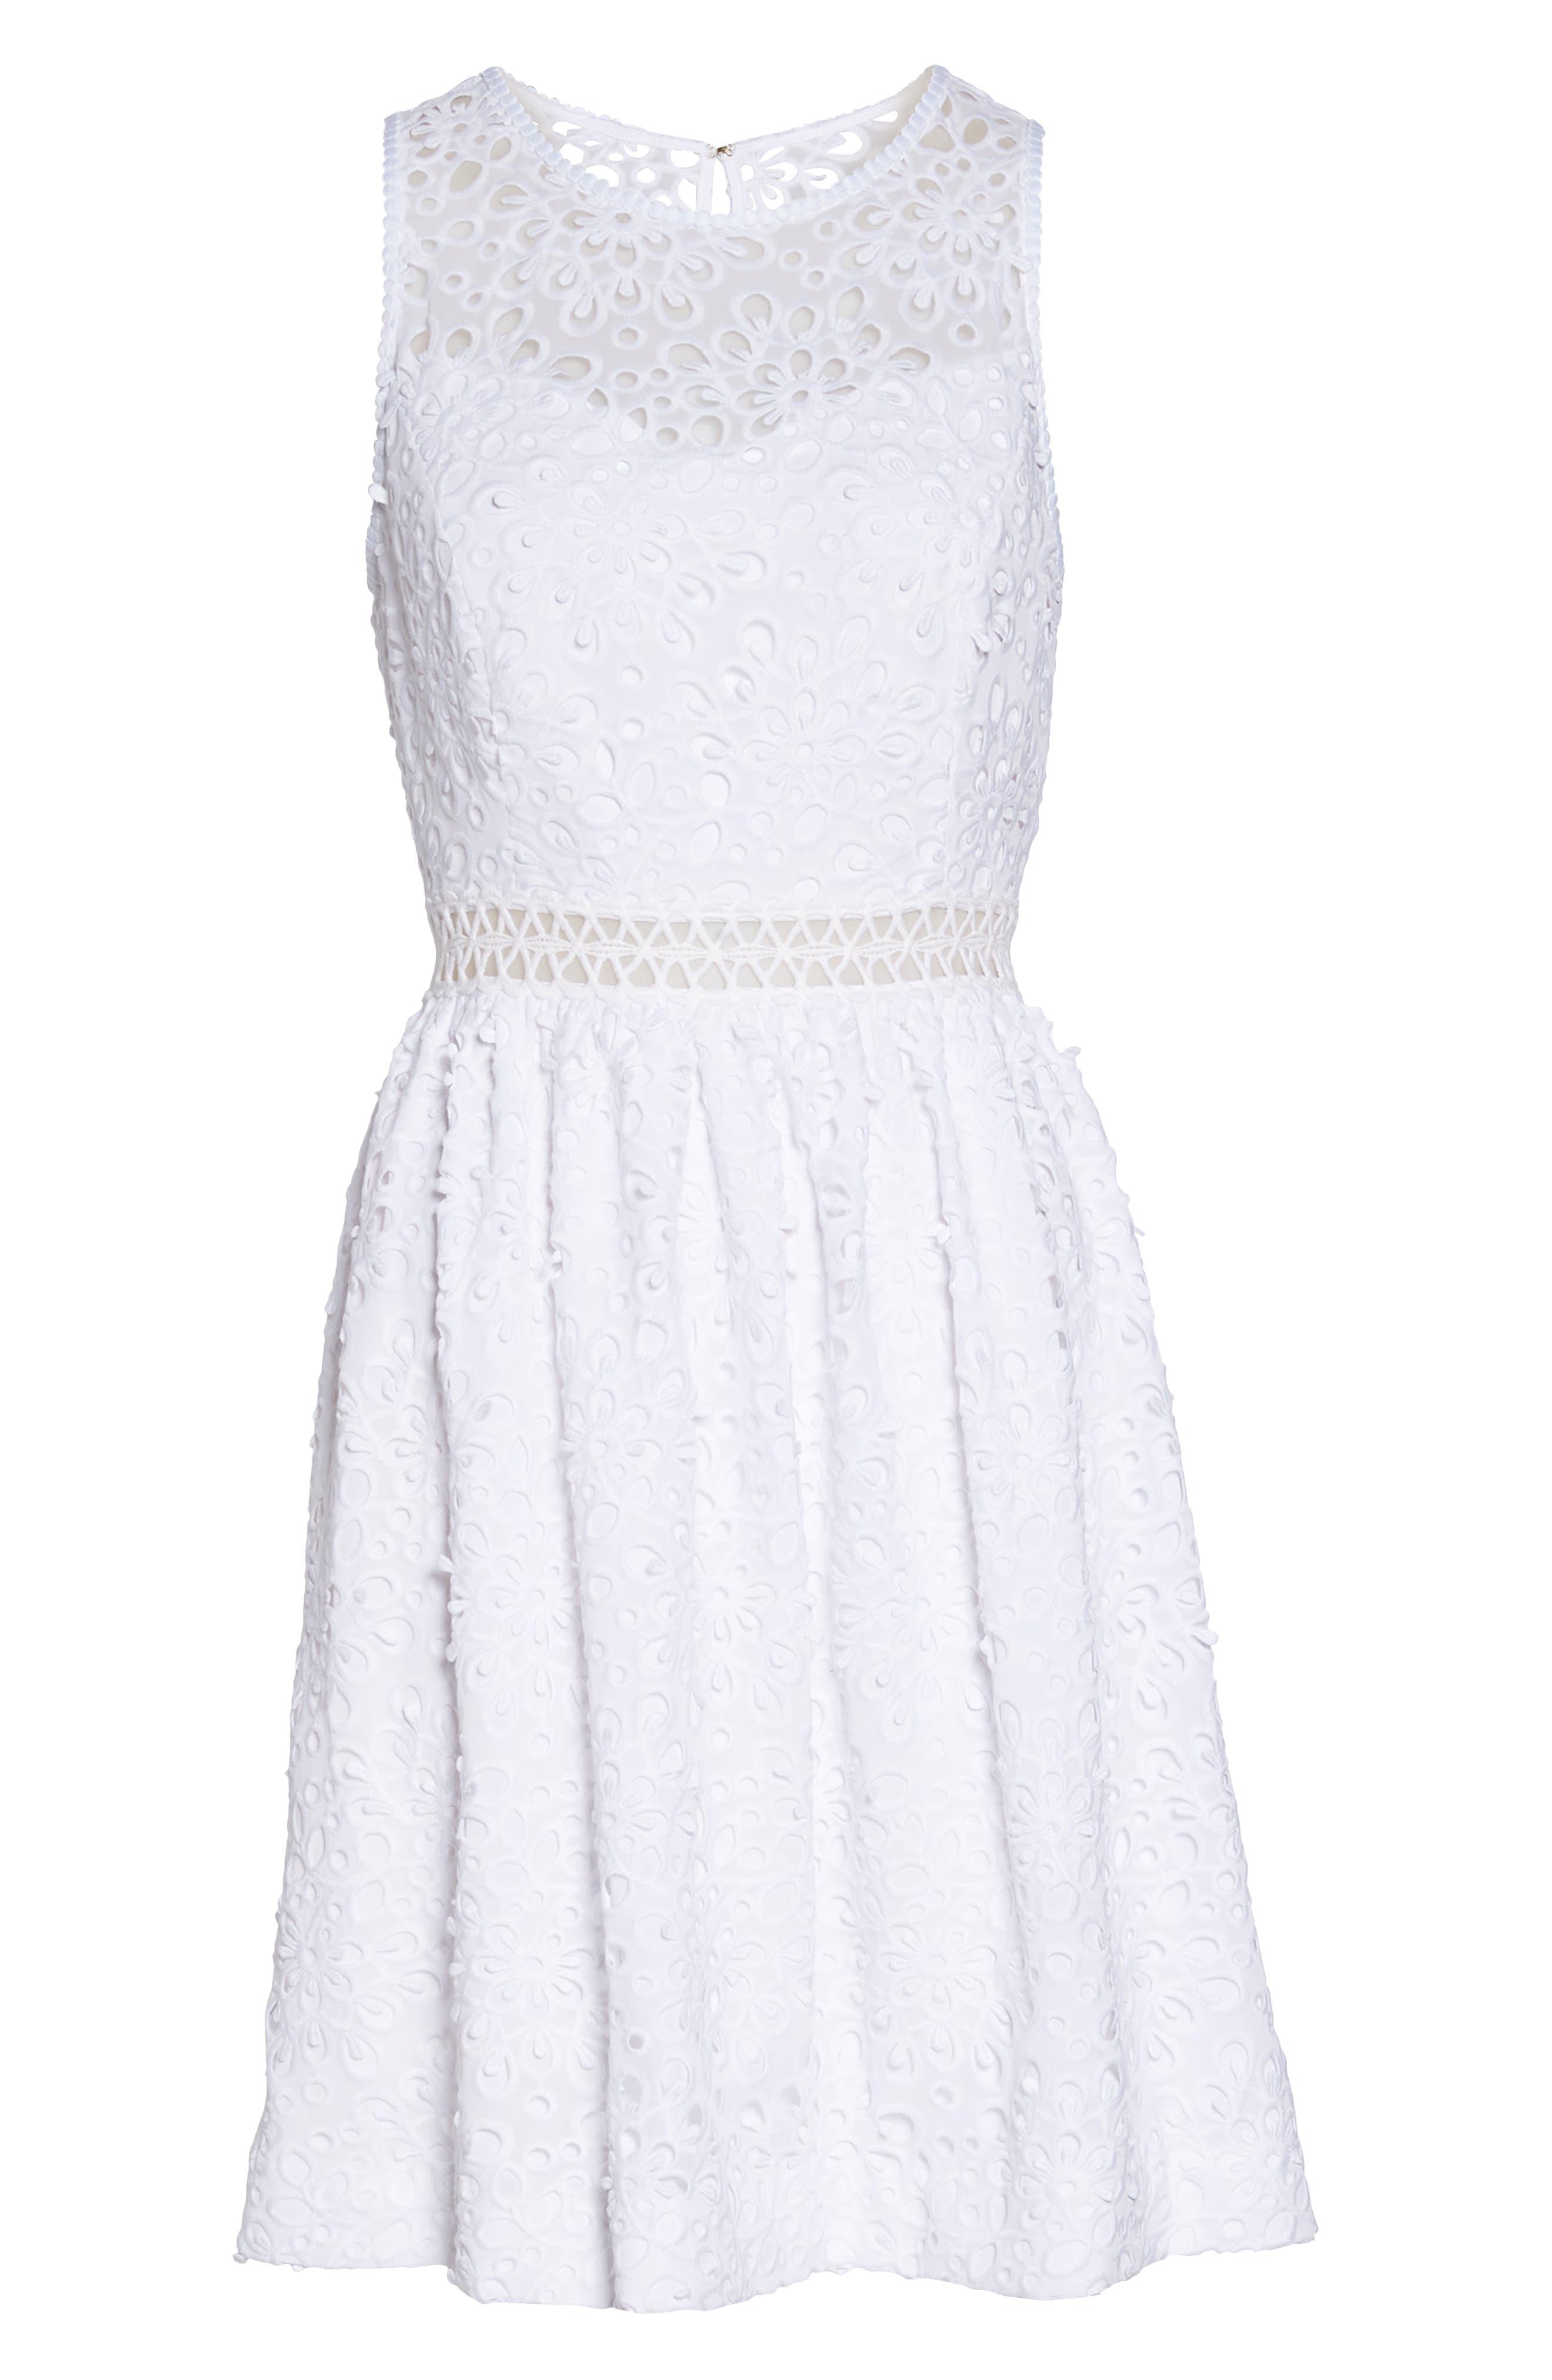 Alivia Eyelet Fit & Flare Dress,                             Alternate thumbnail 6, color,                             Resort White Sea Spray